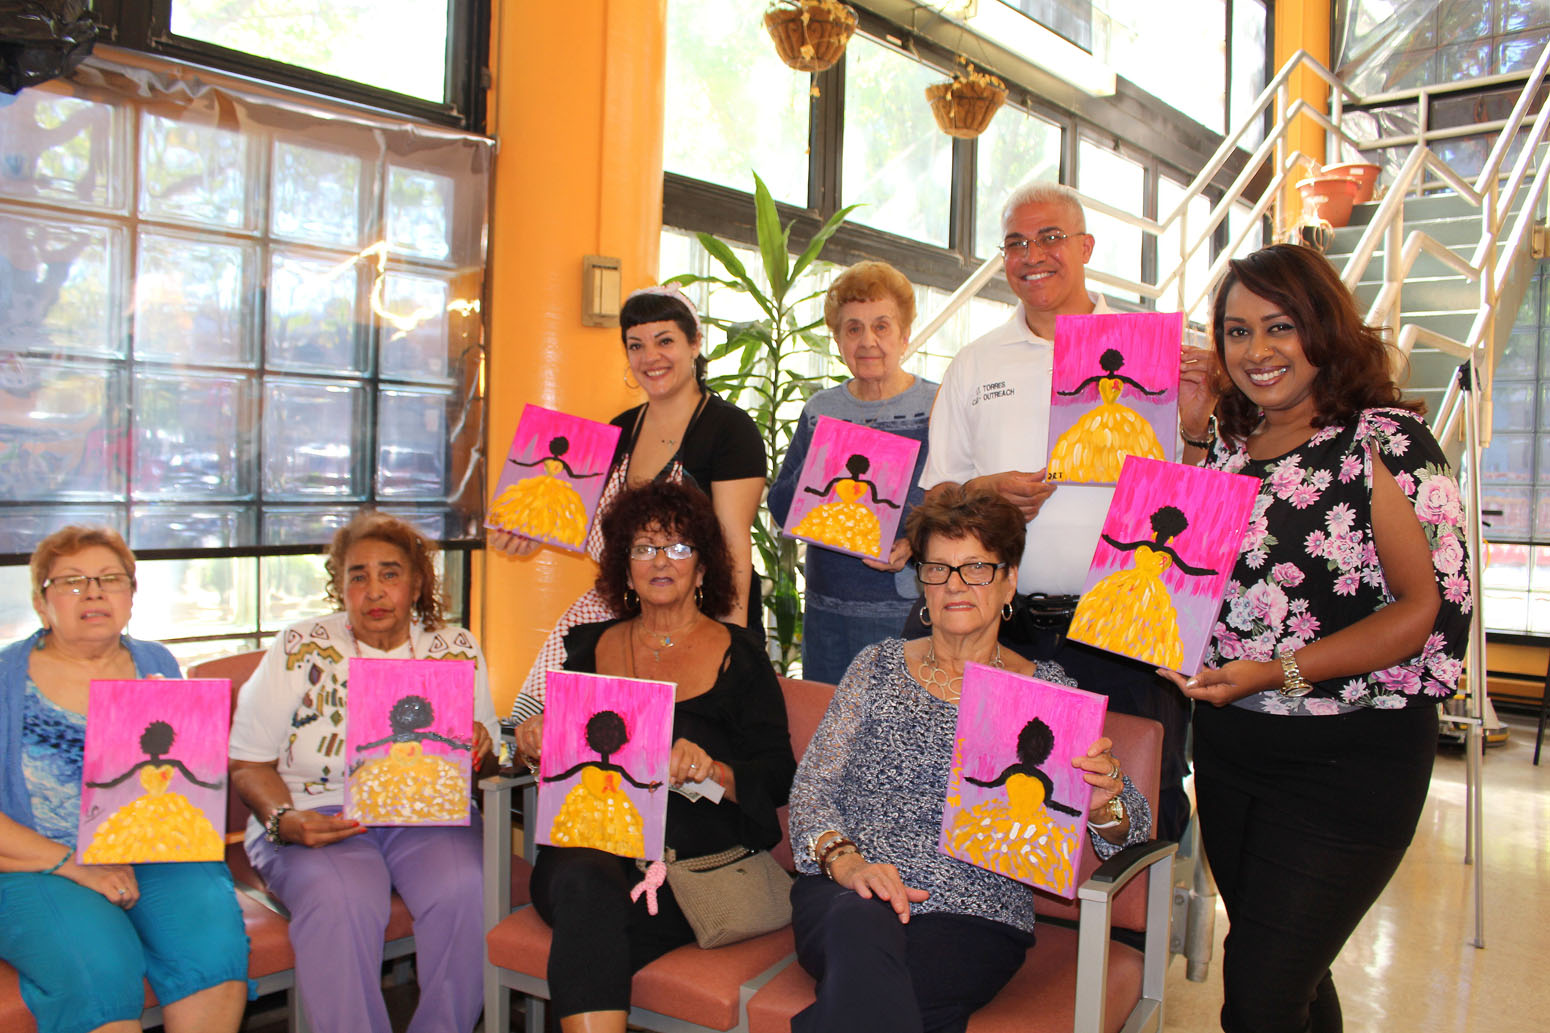 Top: Laura Alvarez, Mary Prezioso, Lt. Jose Torres, Bottom: Lucila Alvarez, Rosa Rivera, MaryAnn Lyman, Silvana Pagliaro and Bharati S. Kemraj